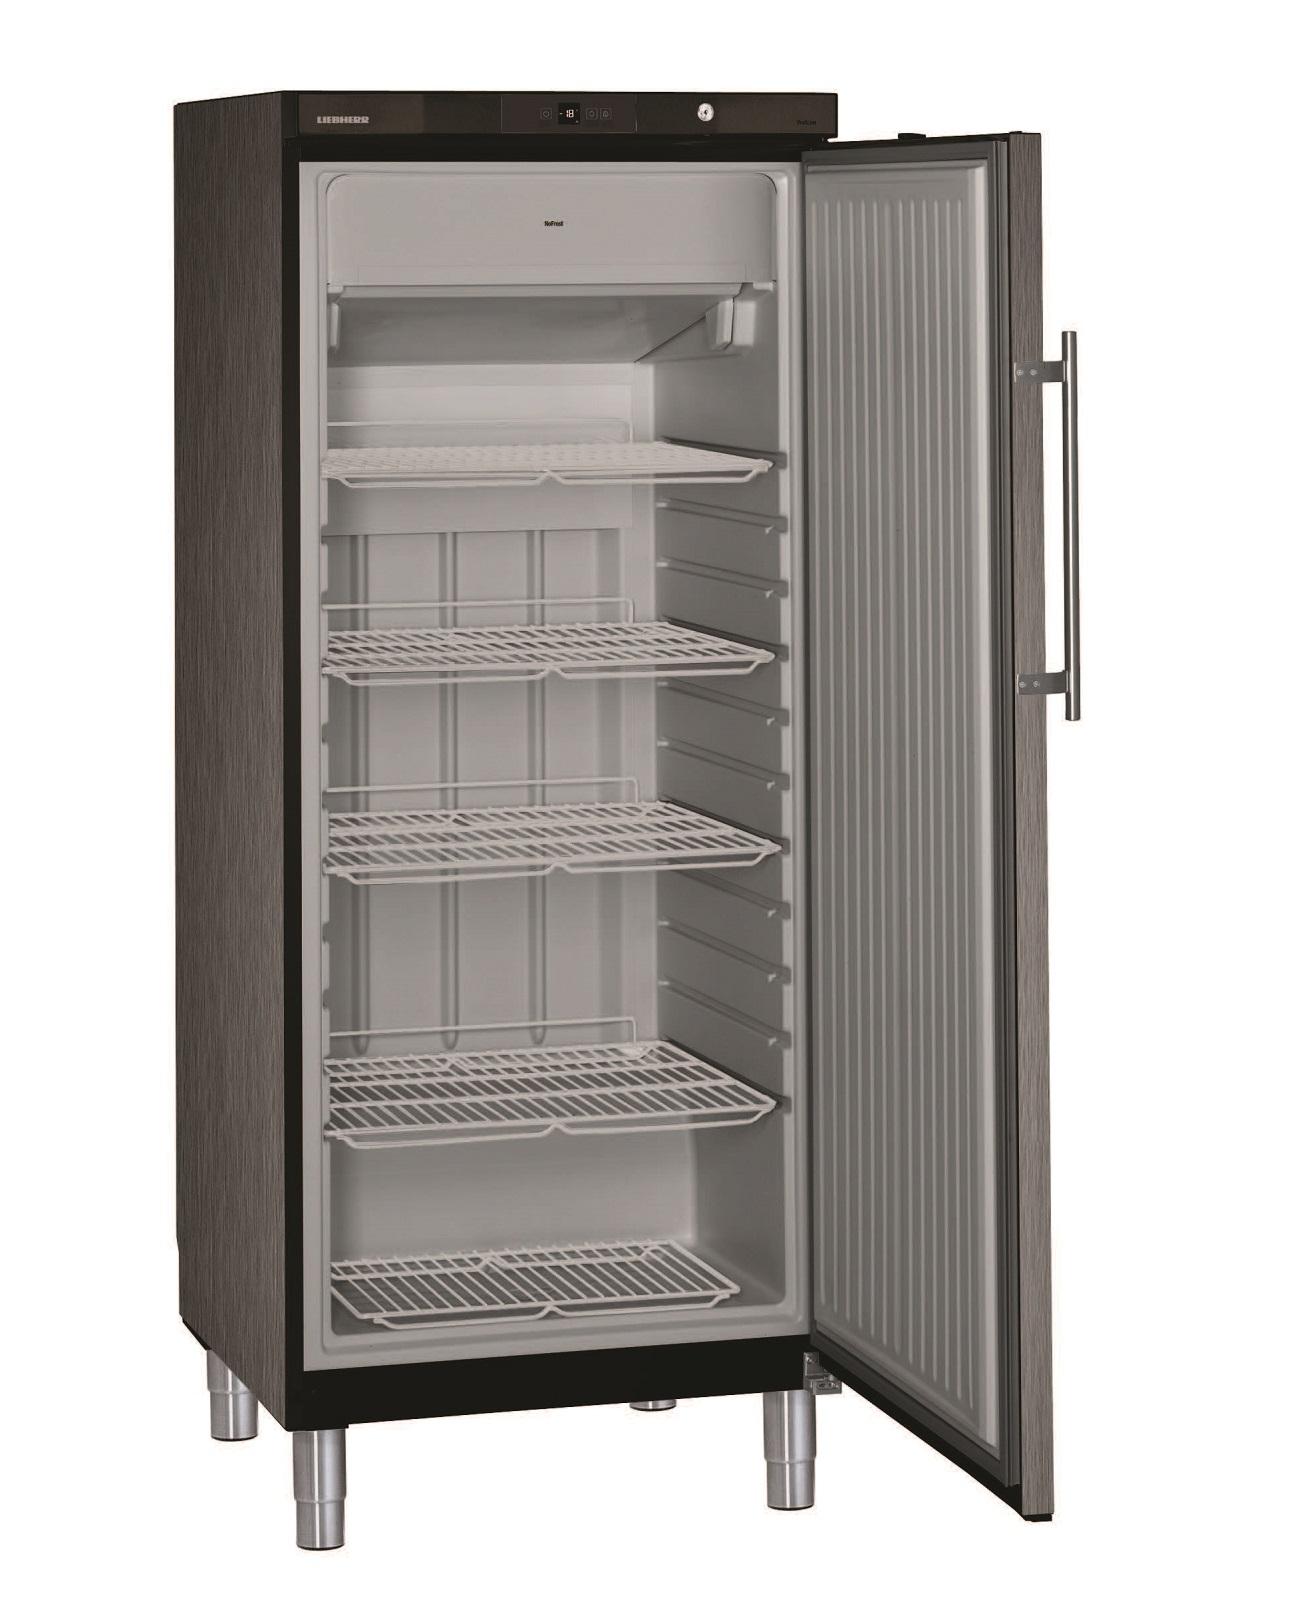 Морозильный шкаф Liebherr GGvbs 5060 купить украина